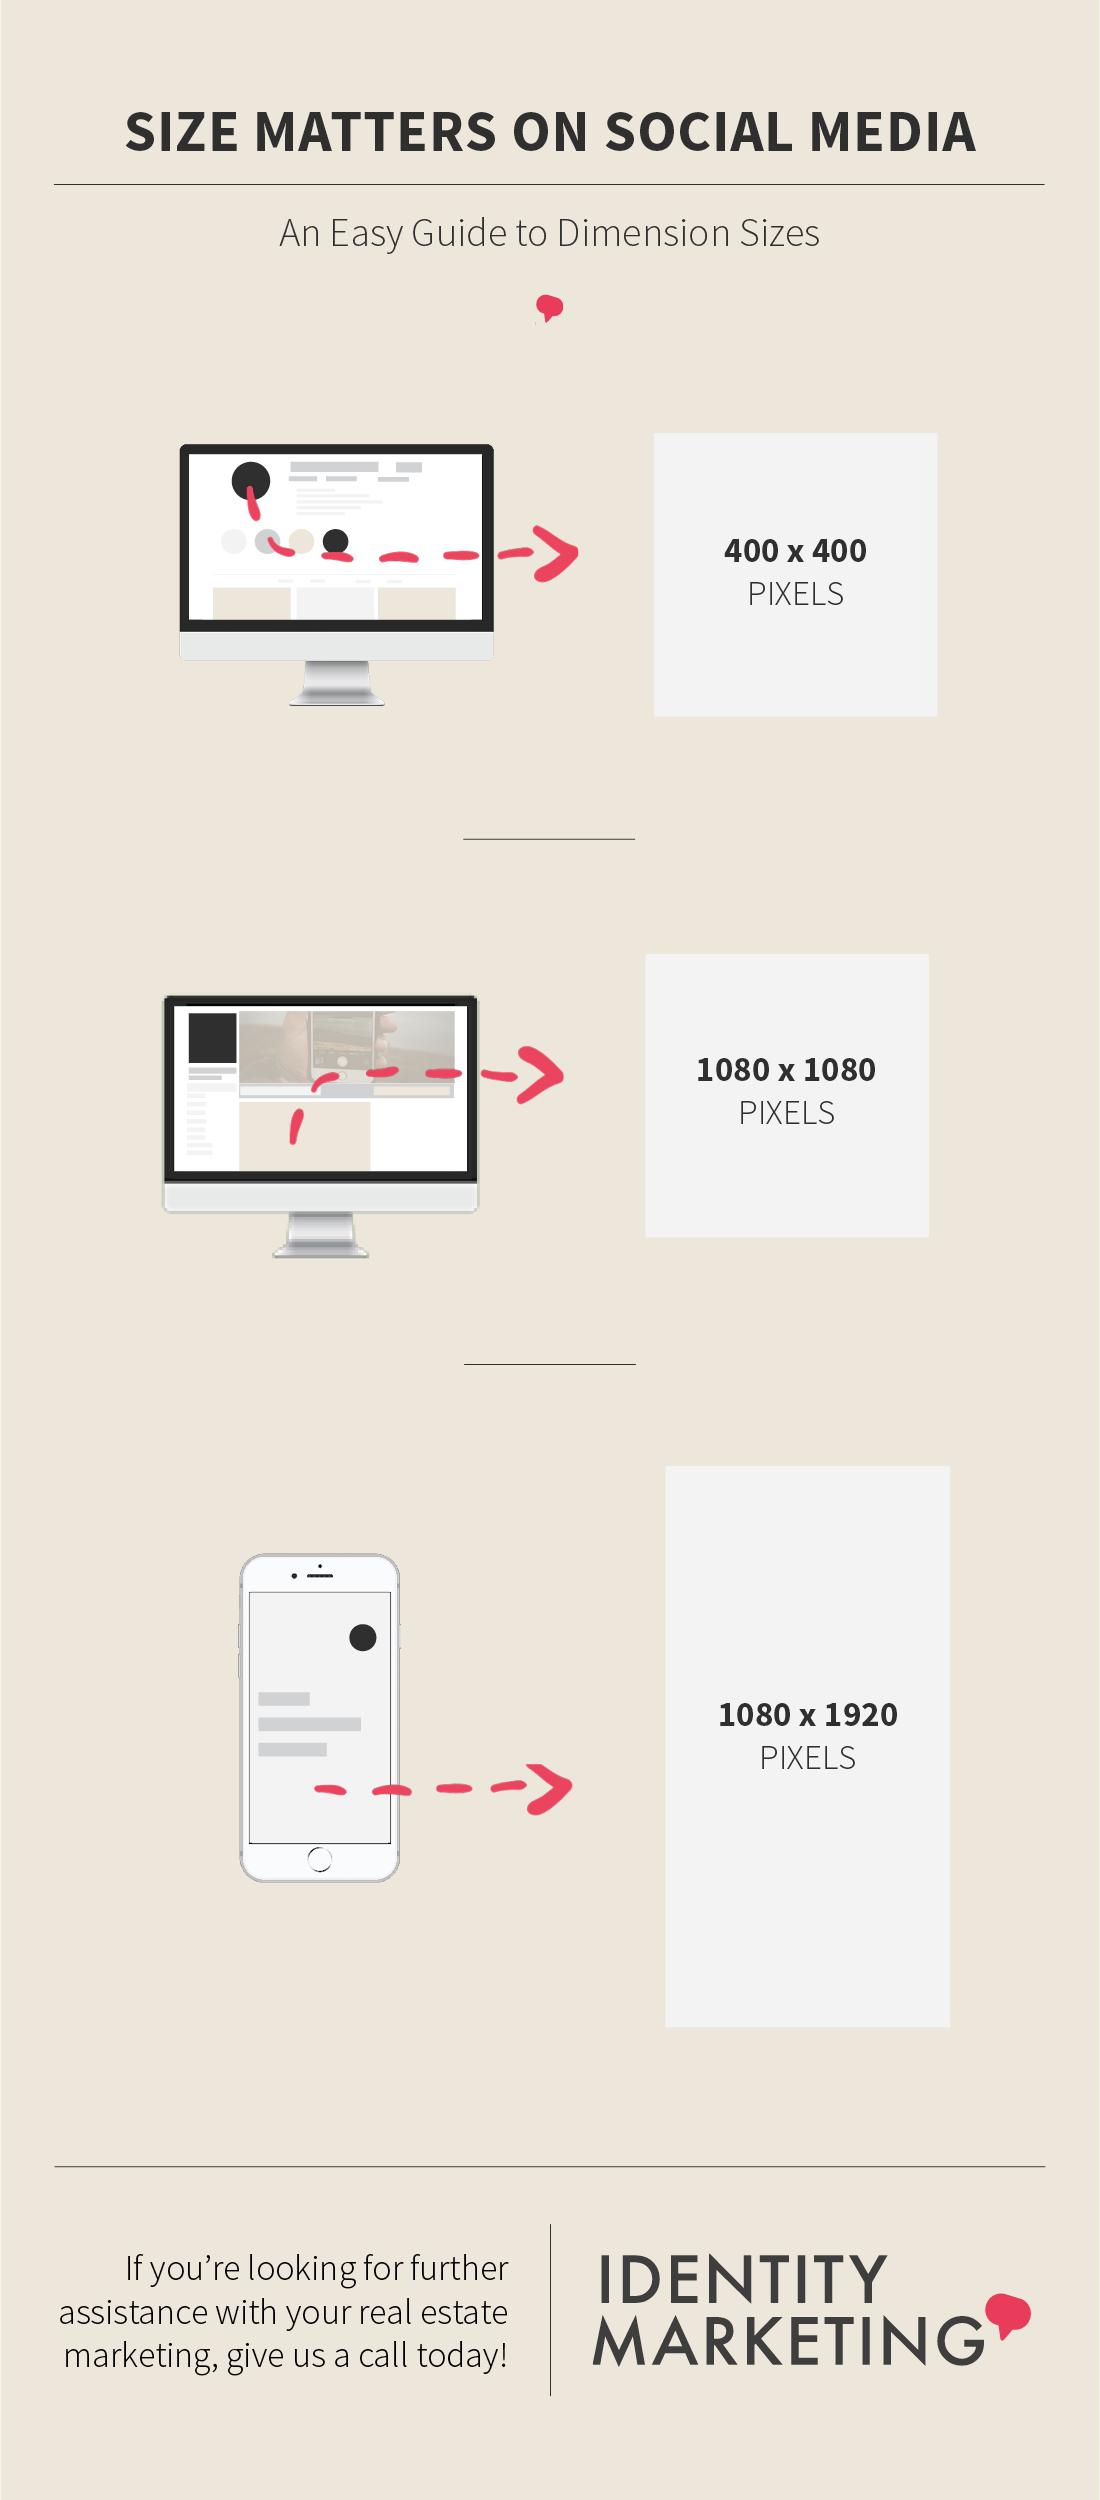 Size Matters on Social Media | Identity Marketing